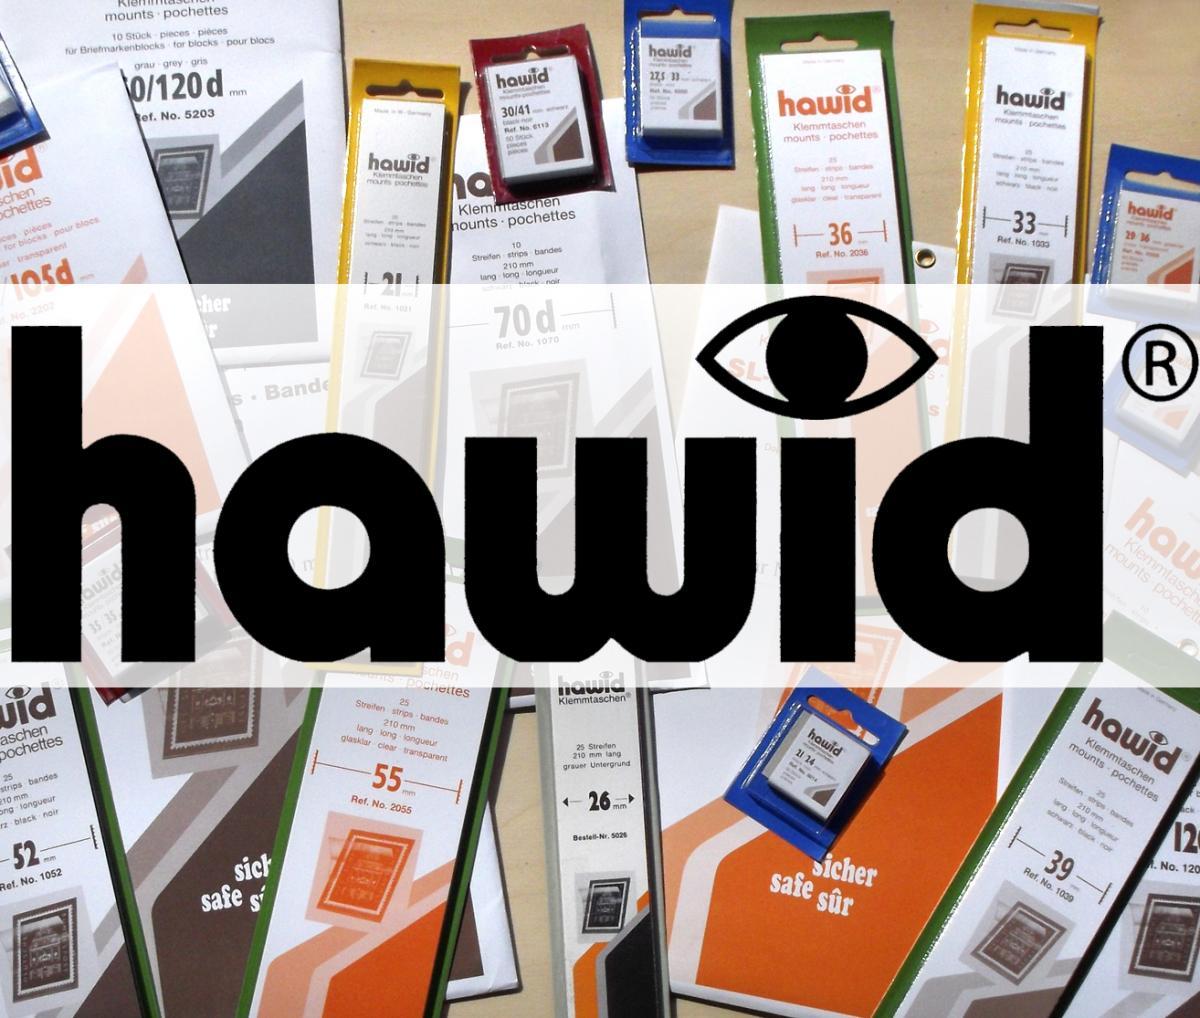 HAWID-Sonderblocks 2301, 100x60 mm, glasklar, 10 Stück 0